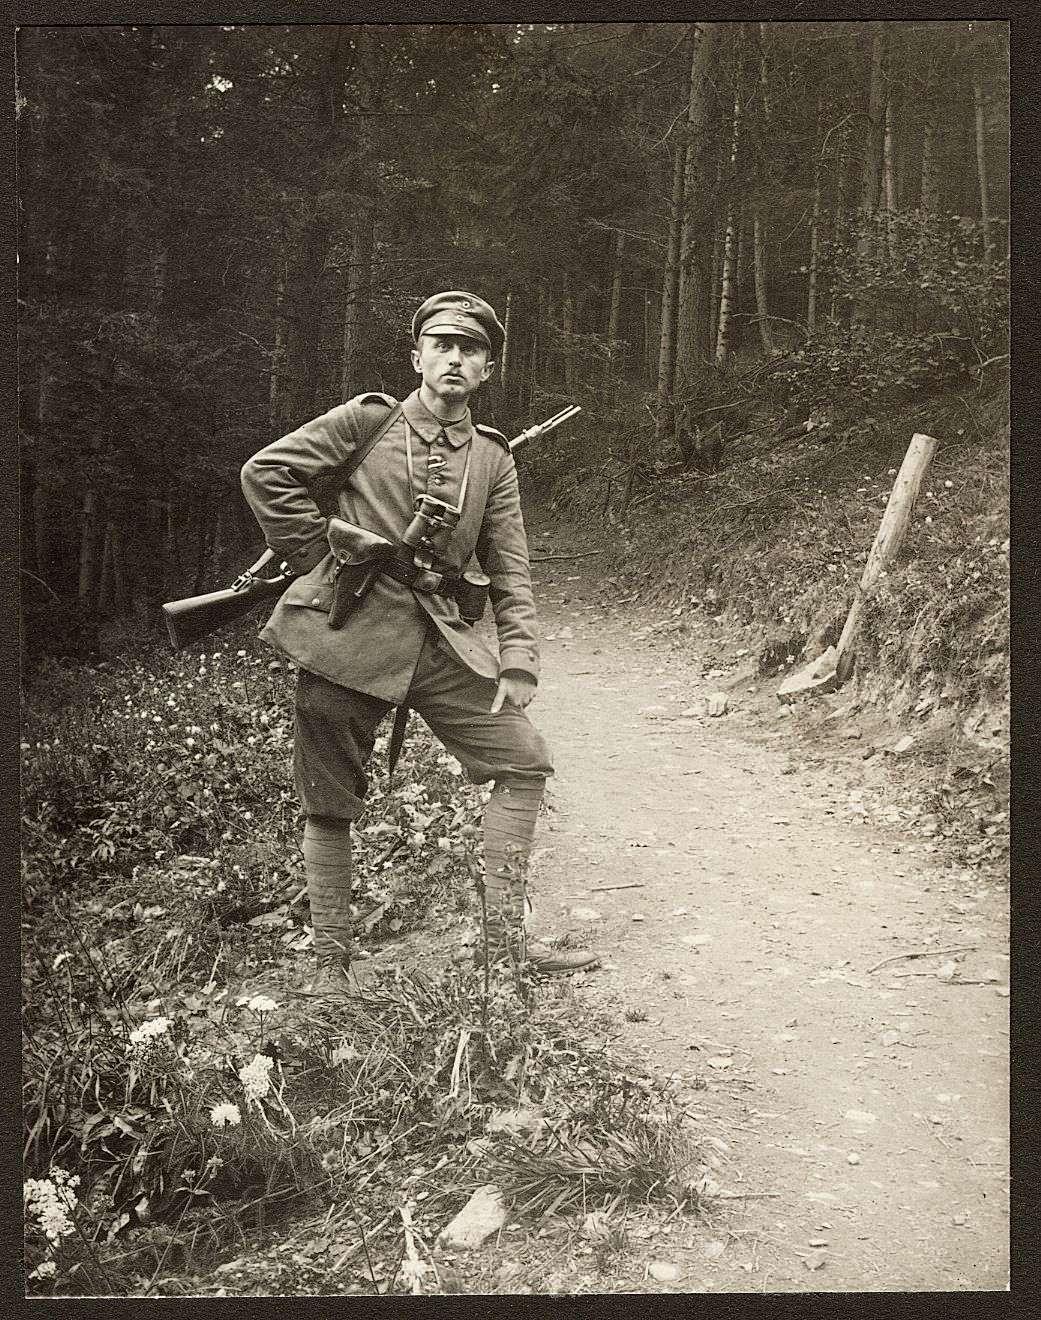 Bochtler, Paul, Bild 3